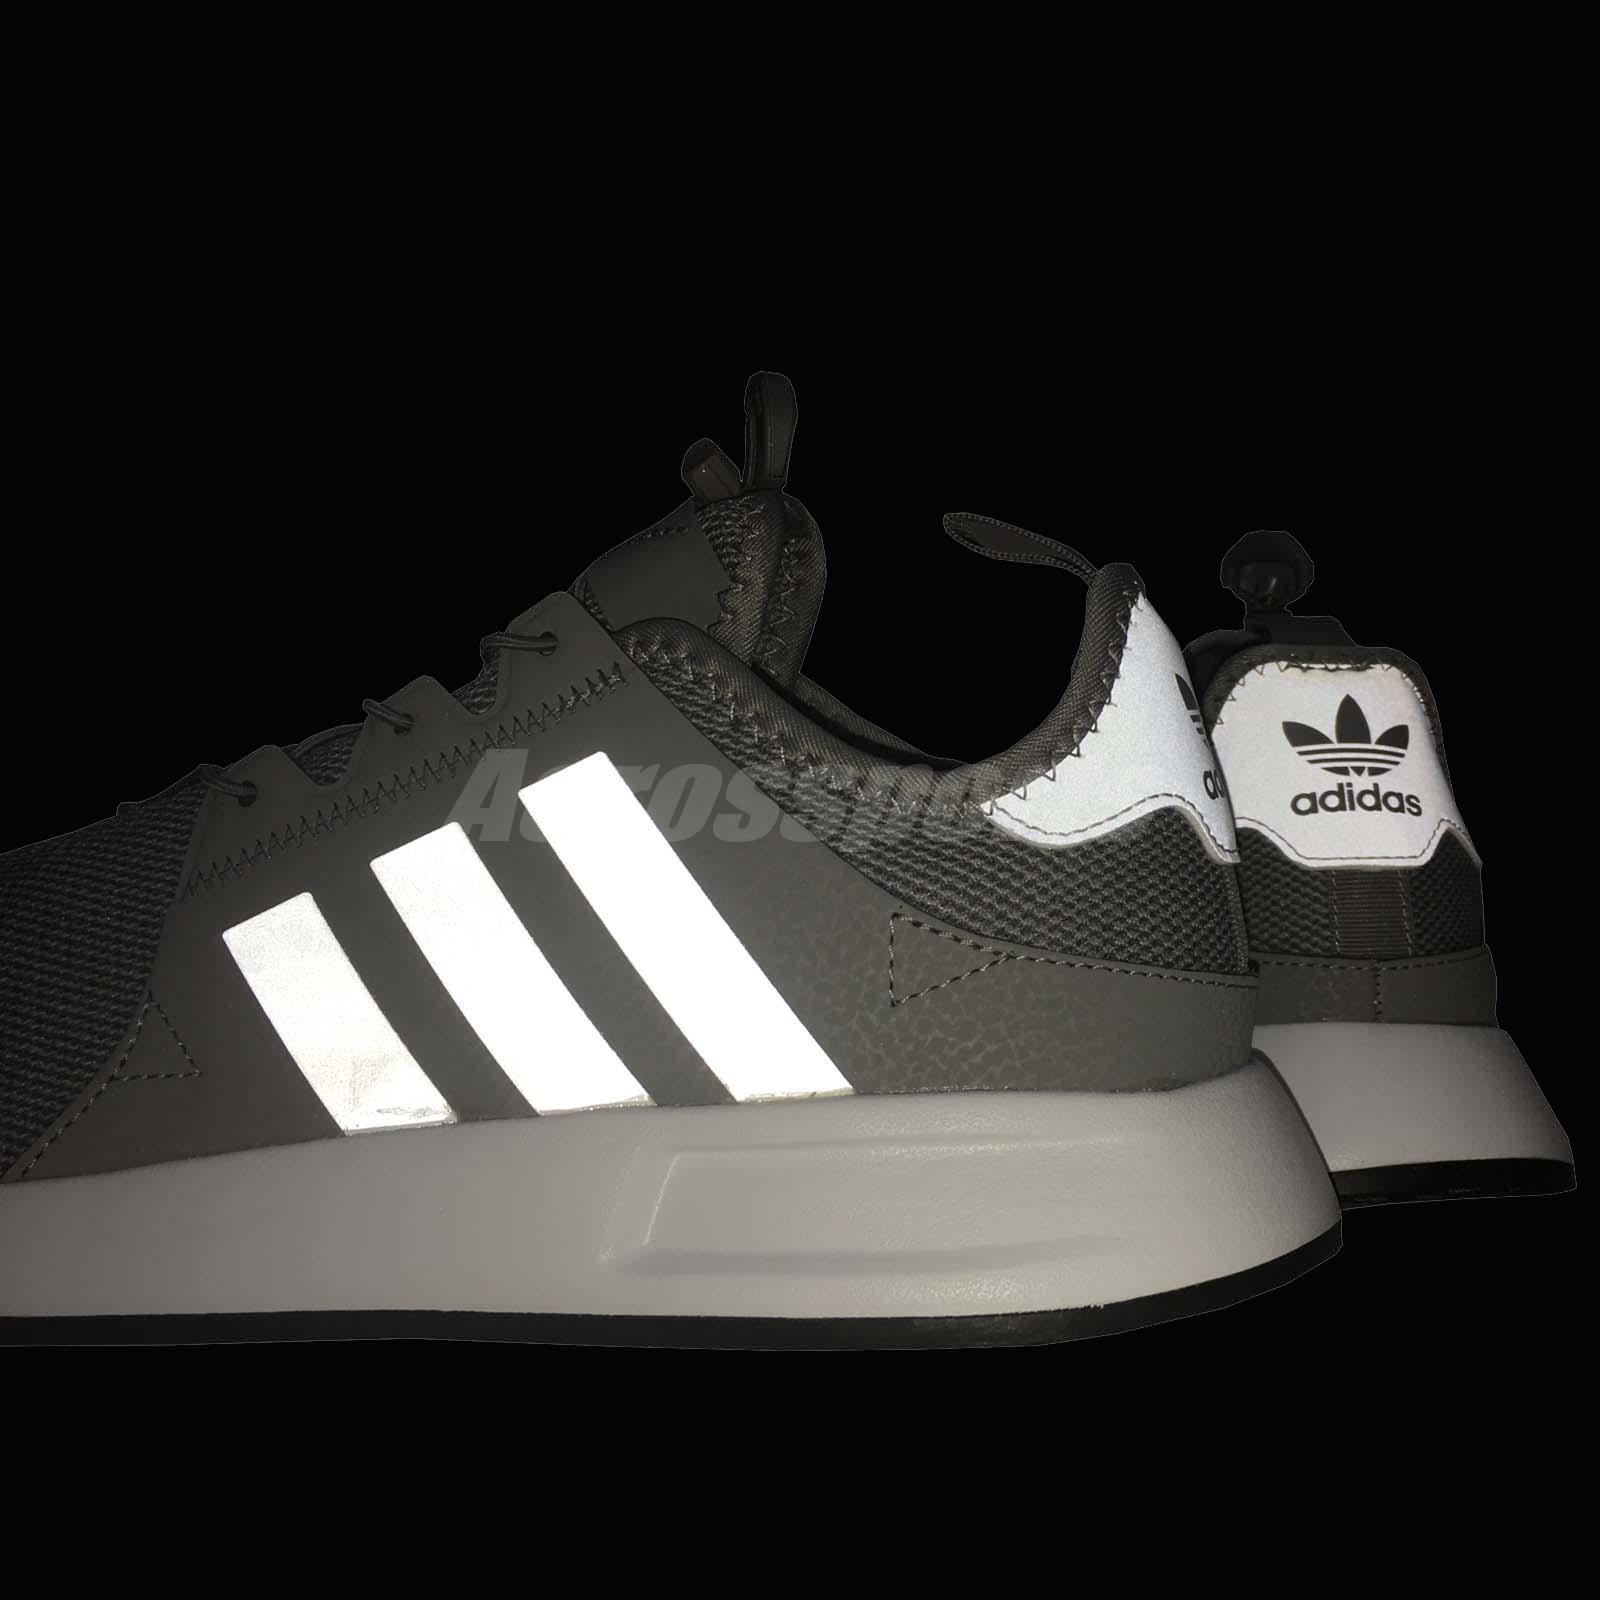 adidas shoes gray